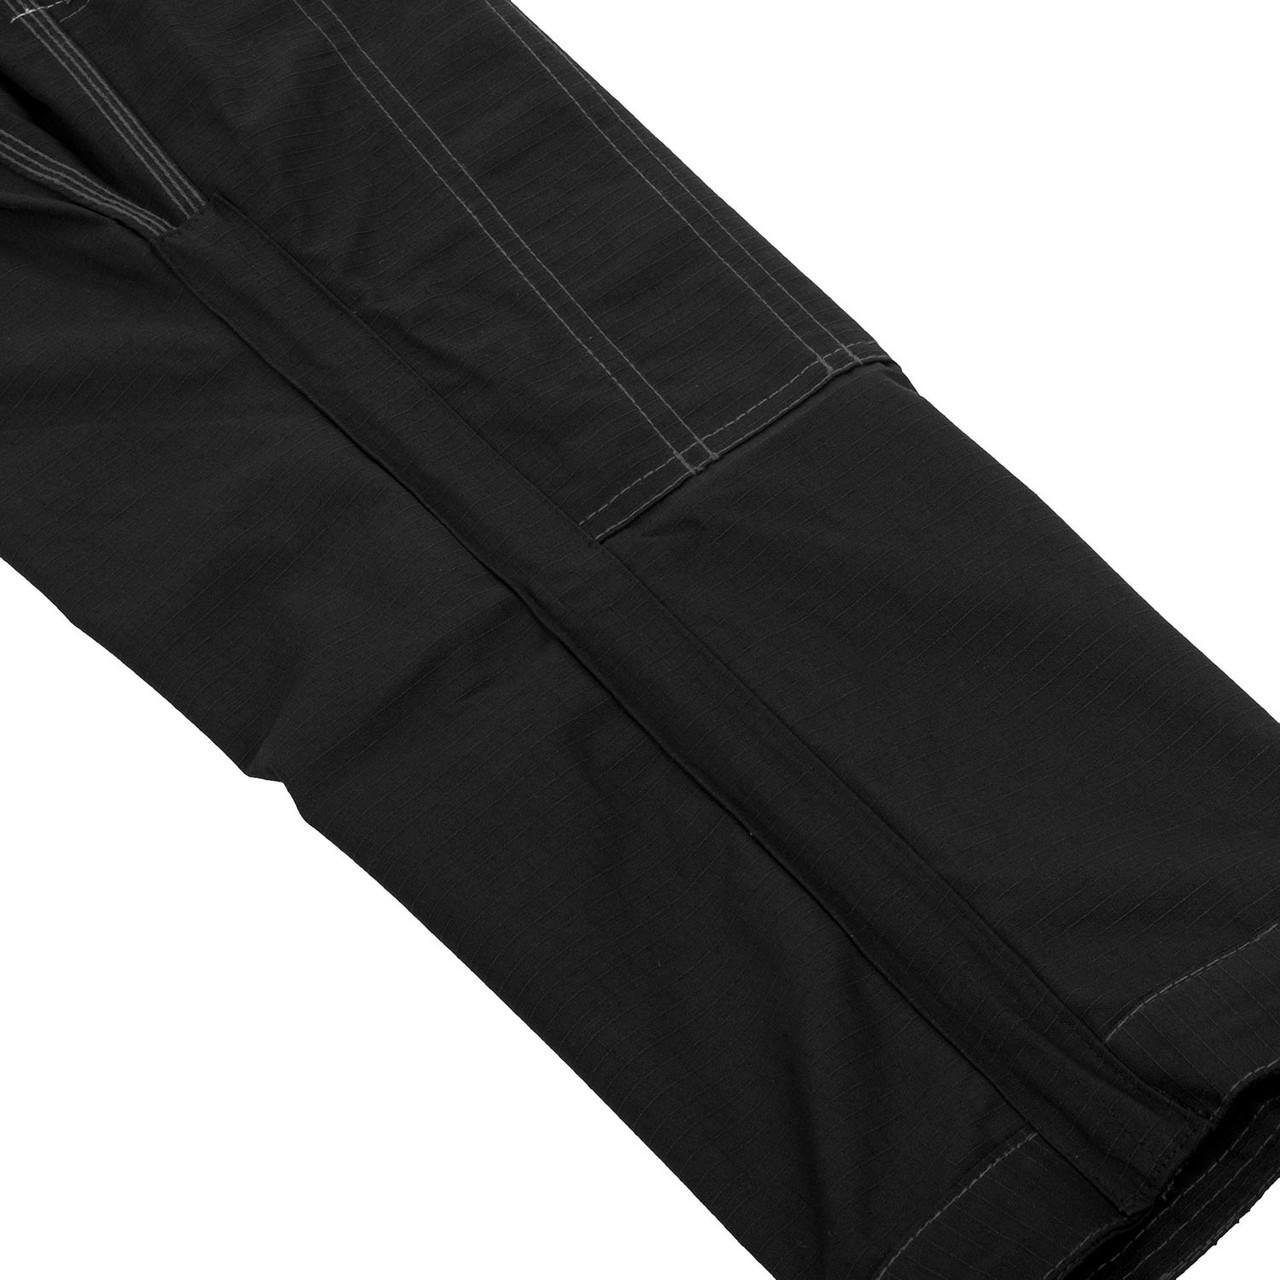 Inside gi pants Venum Elite BJJ GI in Black on black  is now available at www.thejiujitsushop.com  Enjoy Free Shipping from The Jiu Jitsu Shop today!